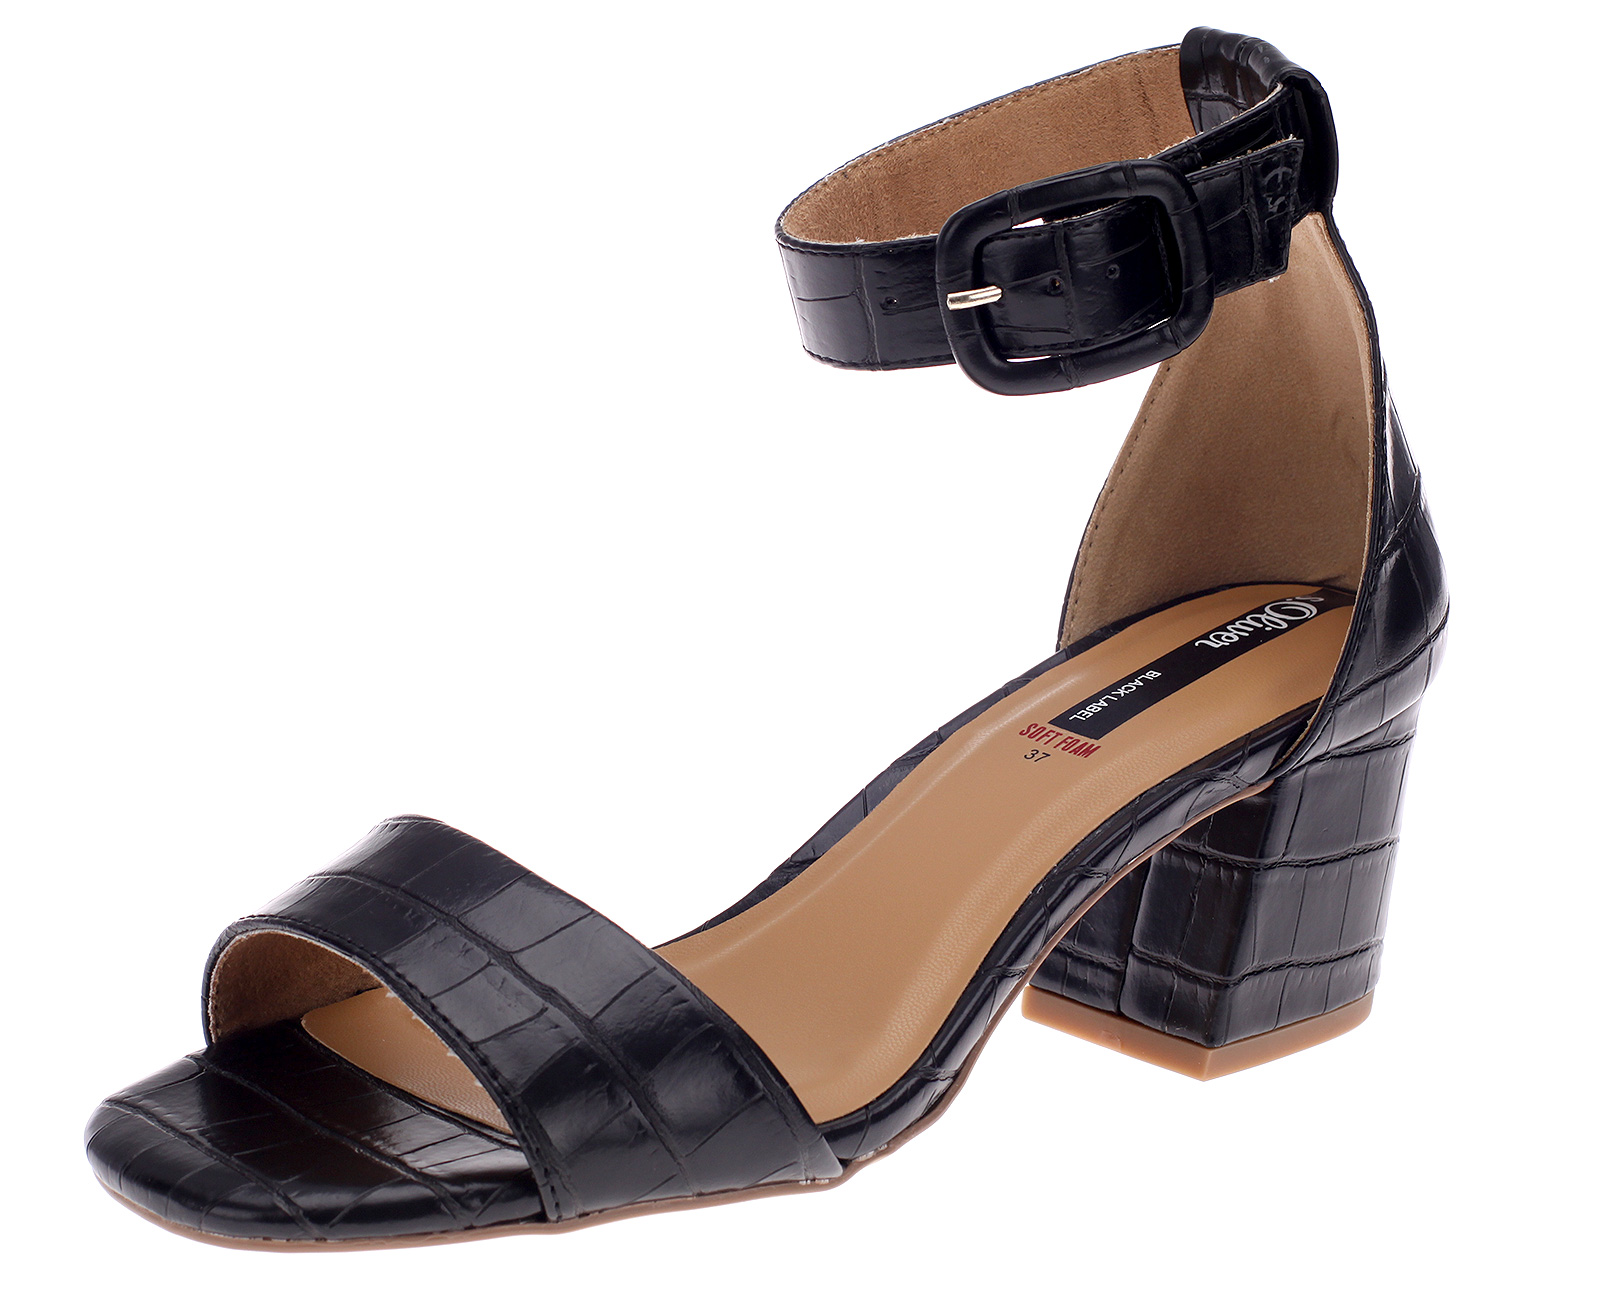 s.Oliver Damen Schuhe Sandaletten Sandale Sommerschuhe Schwarz 28338